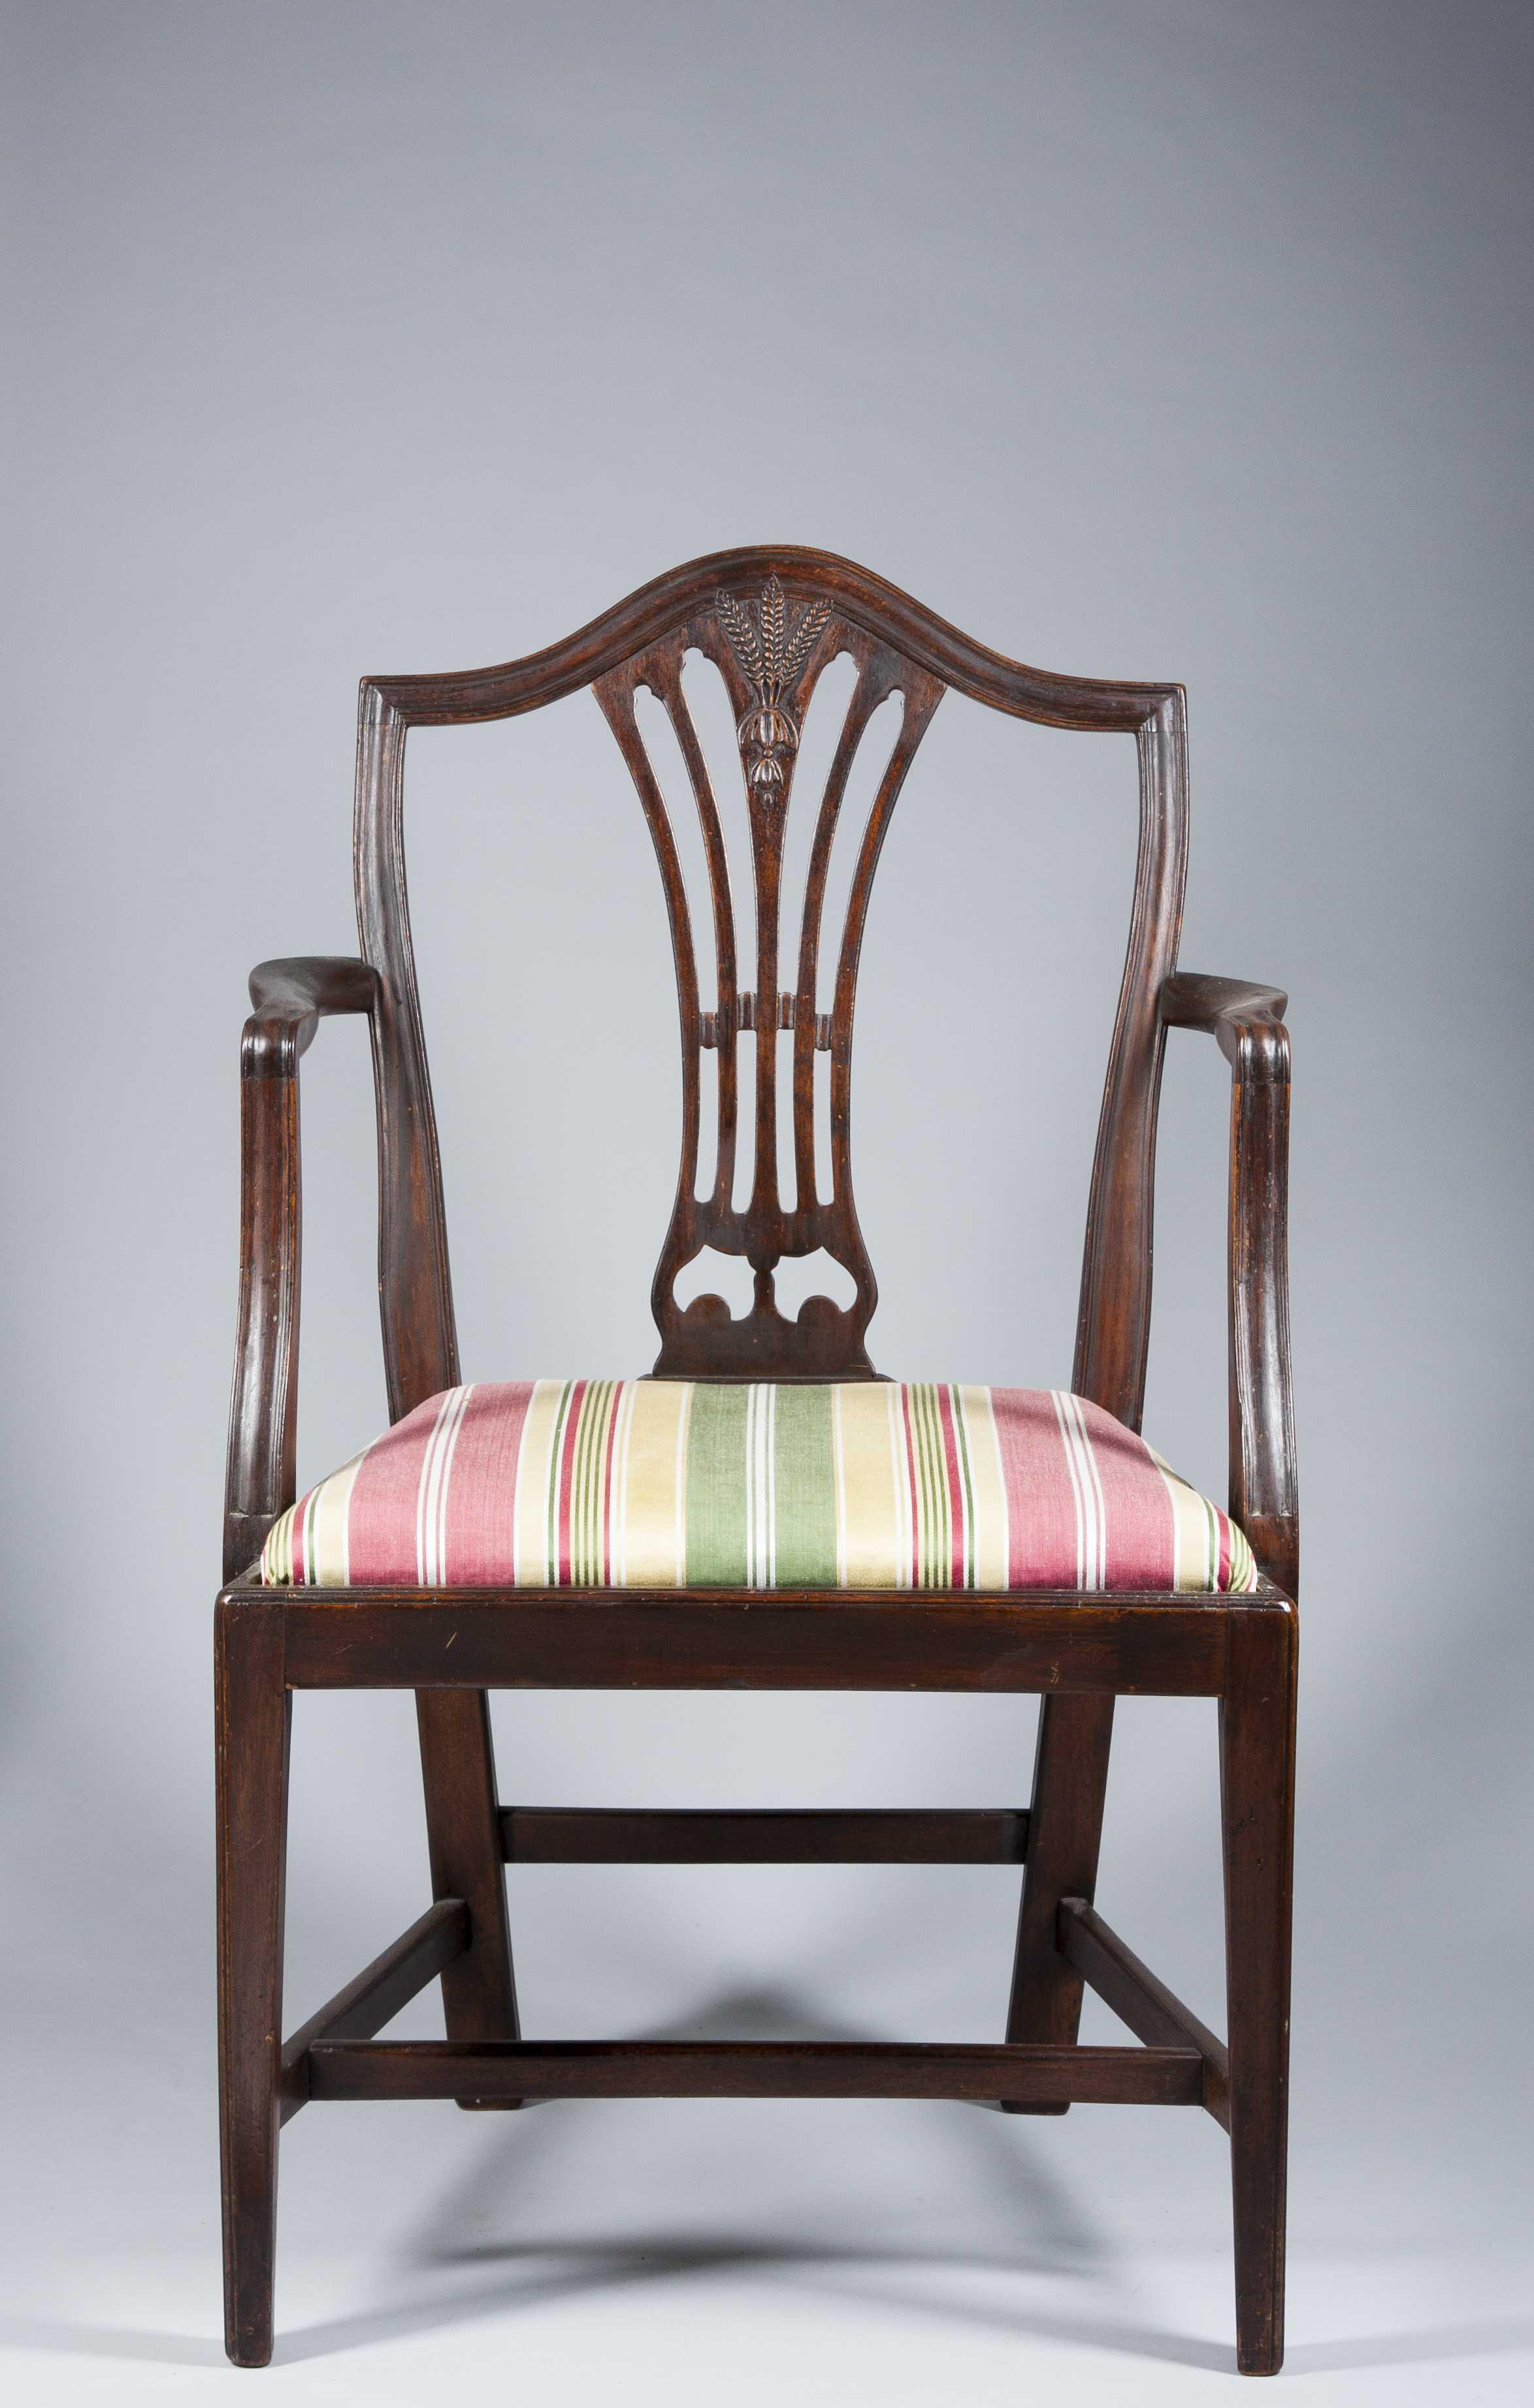 Best Of Hepplewhite Chairs Home Design Ideas # Muebles Estilo Hepplewhite